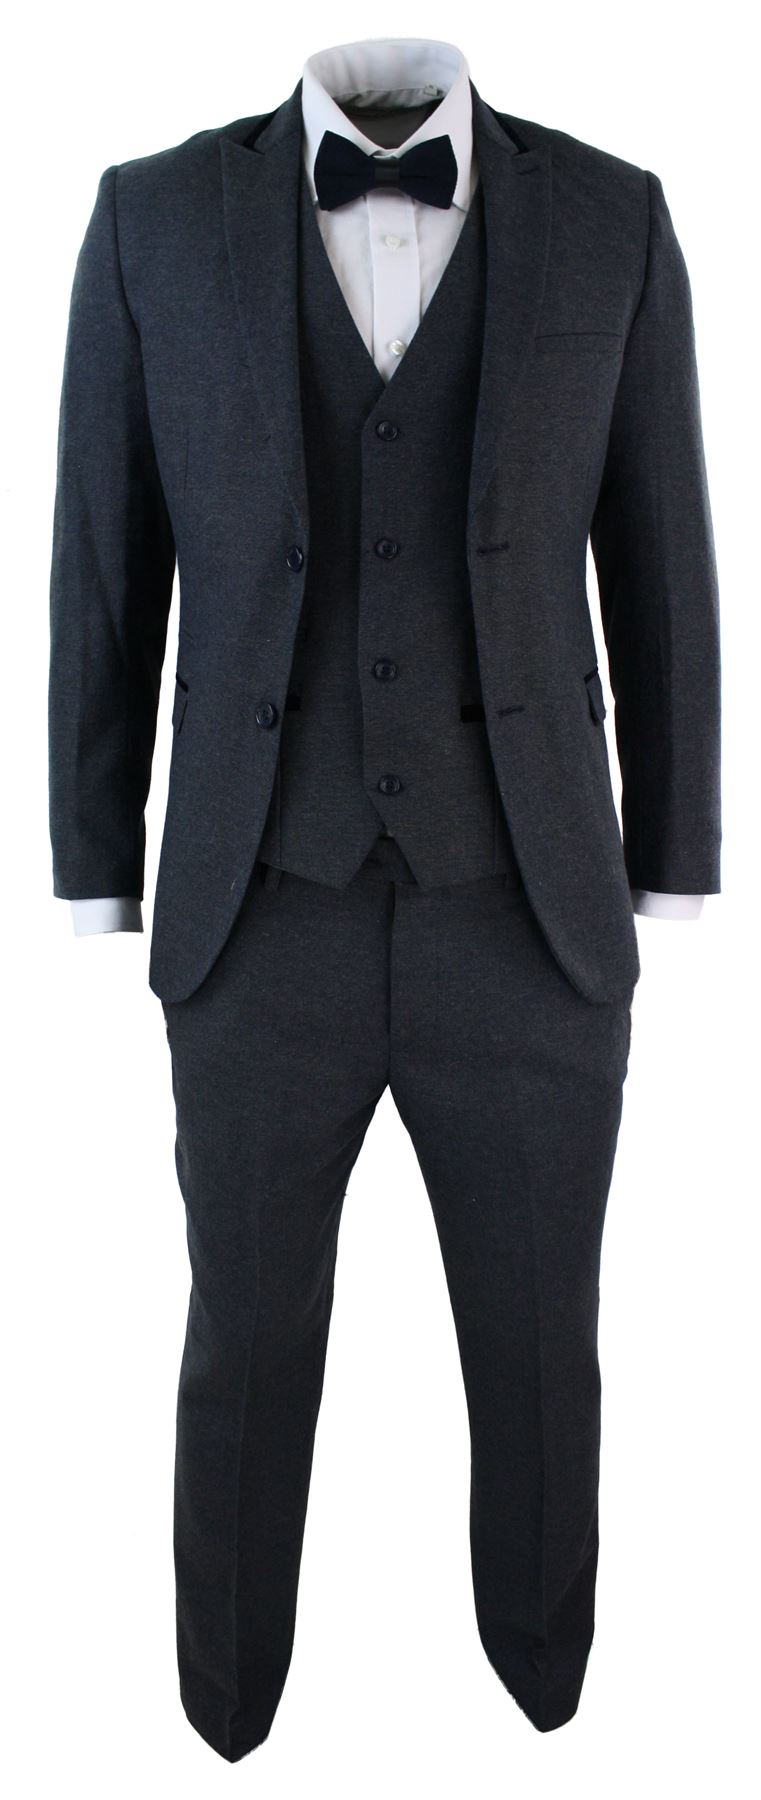 costume 3 pi ces hommes tweed herringbone bleu fonc coupe slim ebay. Black Bedroom Furniture Sets. Home Design Ideas